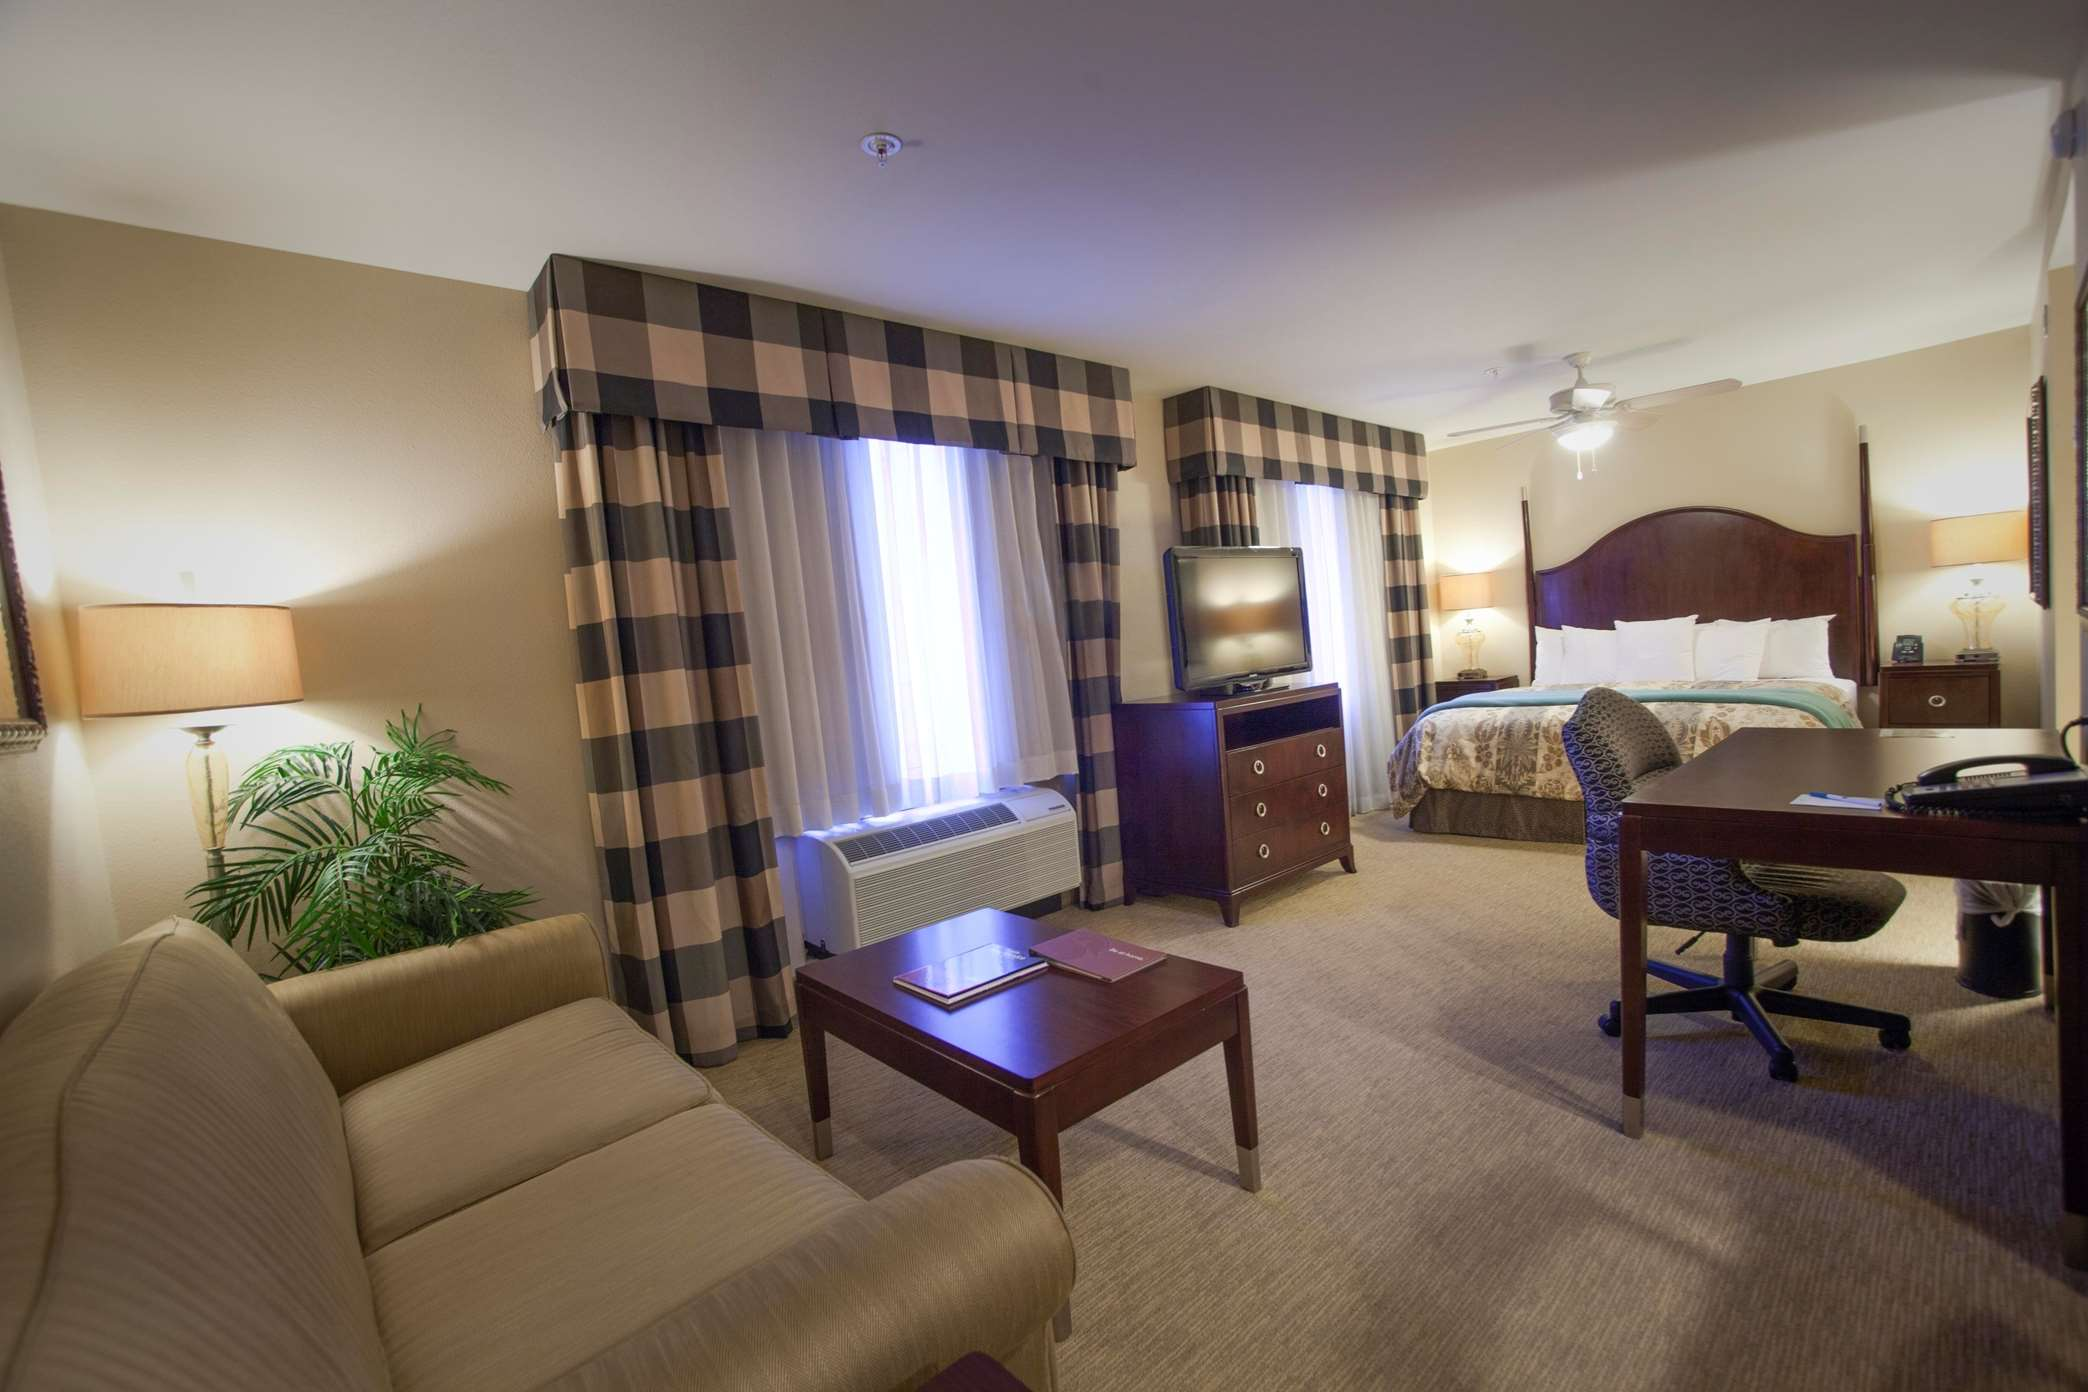 Homewood Suites by Hilton Albuquerque Airport image 6